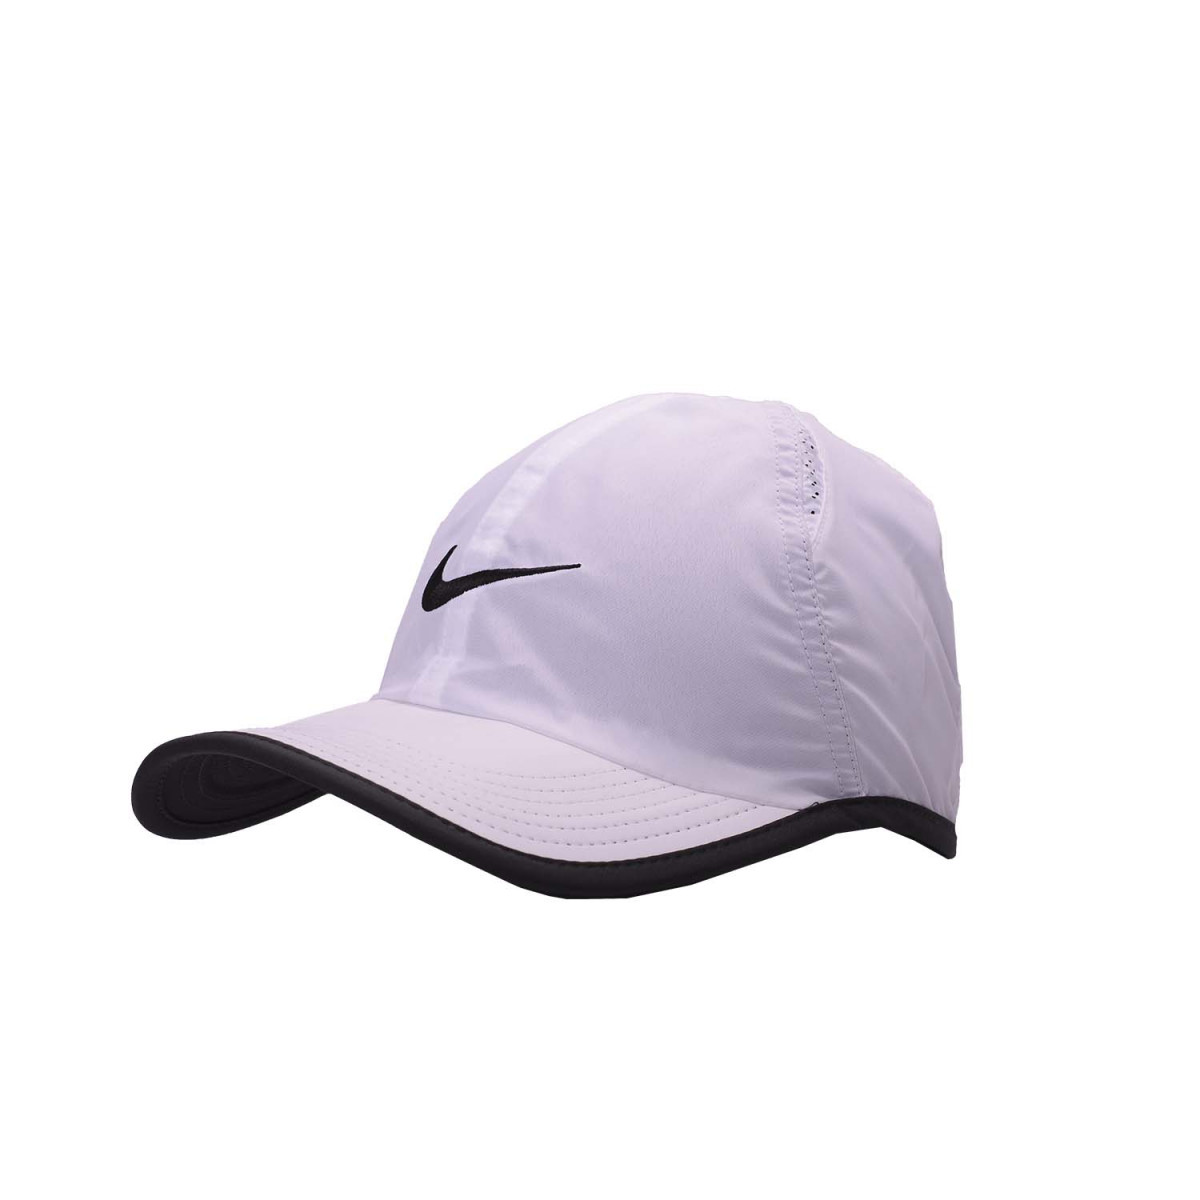 Gorra Nike Feather Light 2.0 - Ofertas - Hombre cbdfd25ec07